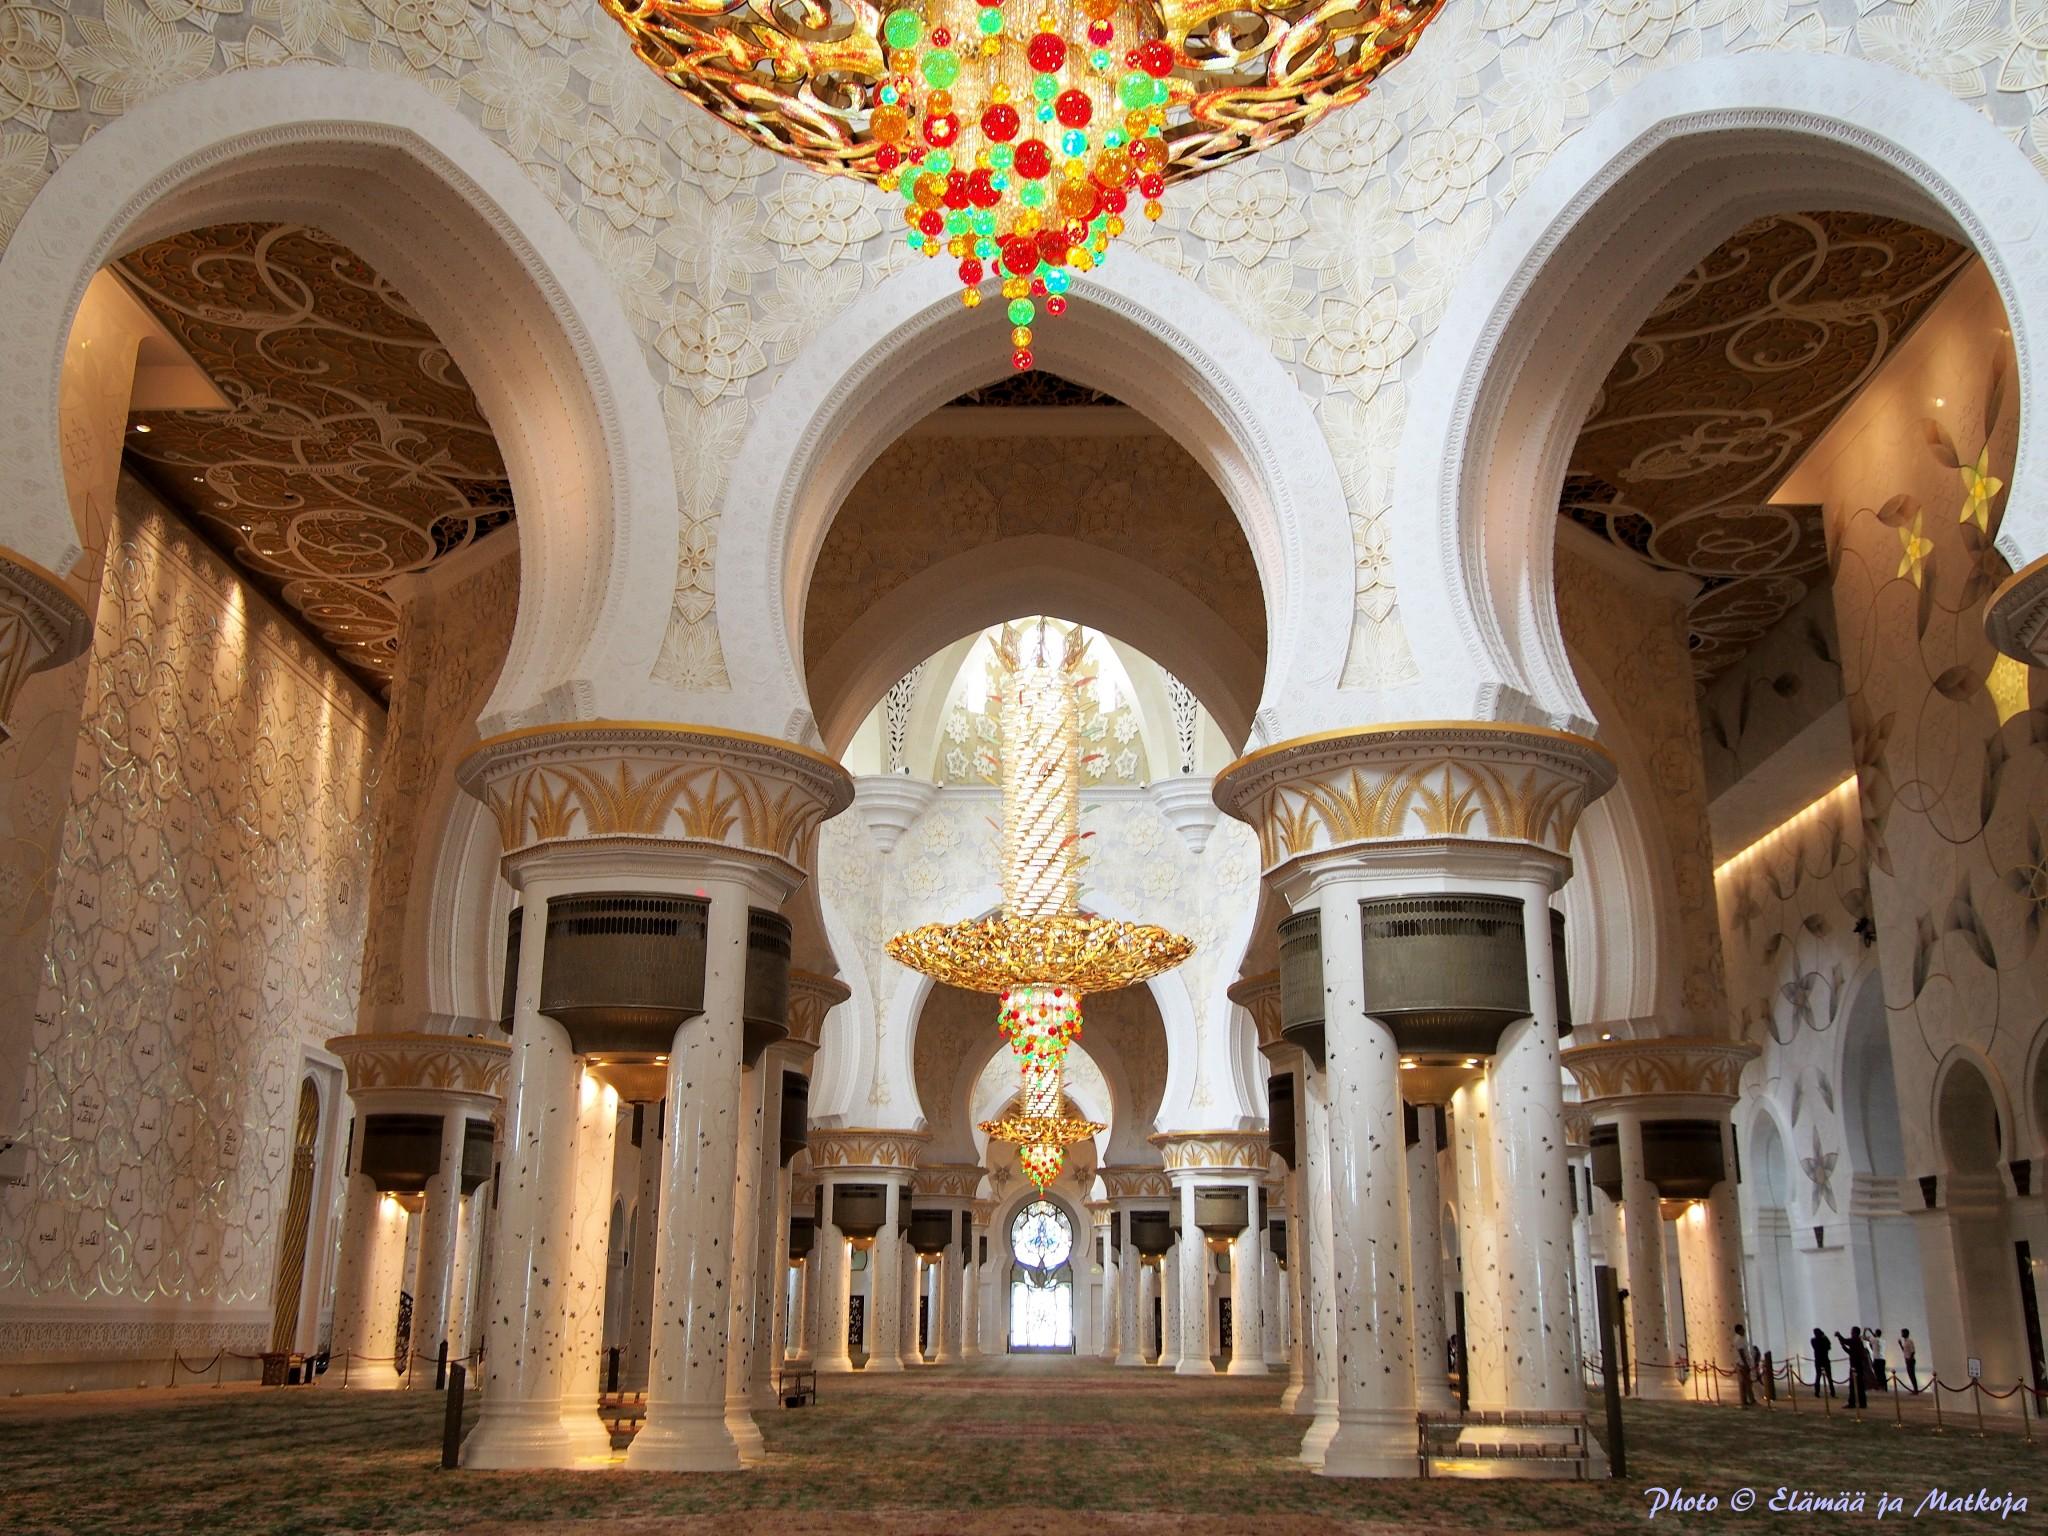 Sheikh Zayed Grand Mosque Abu Dhabi UAE 13 Photo © Elämää ja Matkoja